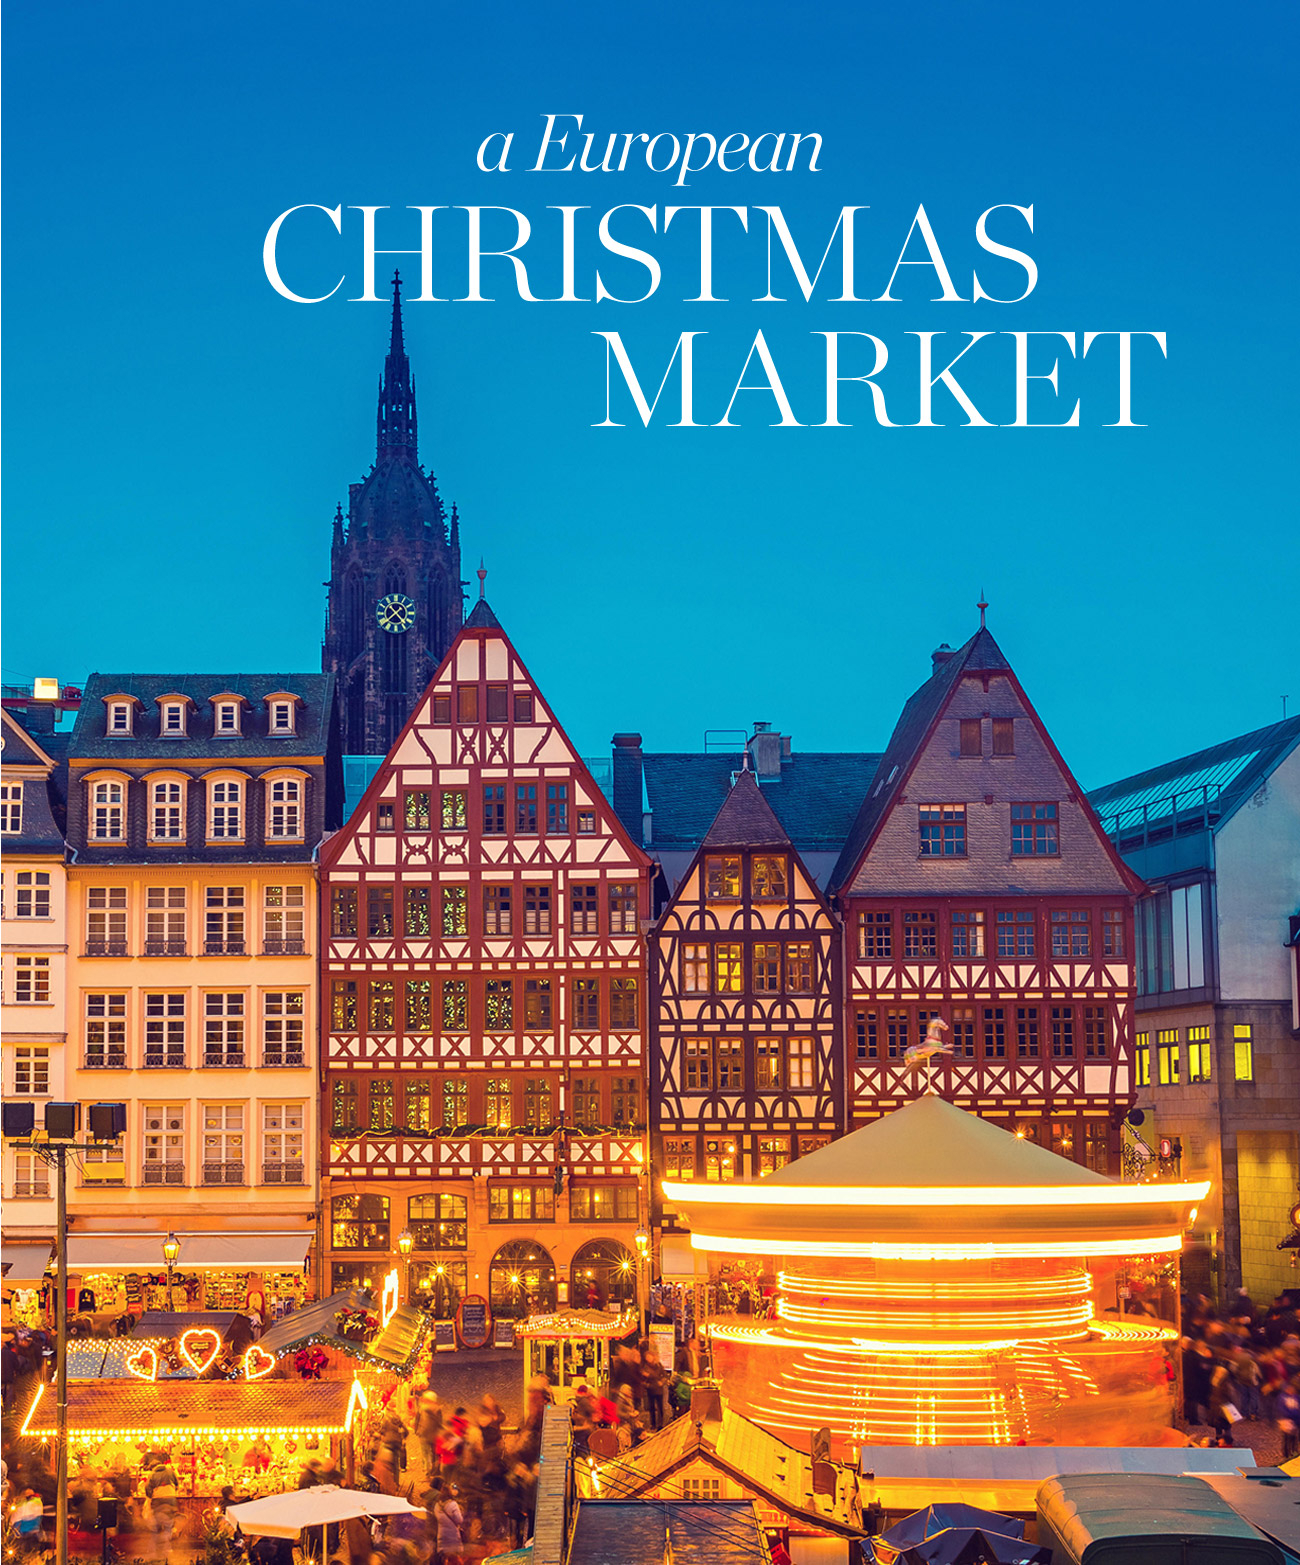 a European CHRISTMAS MARKET